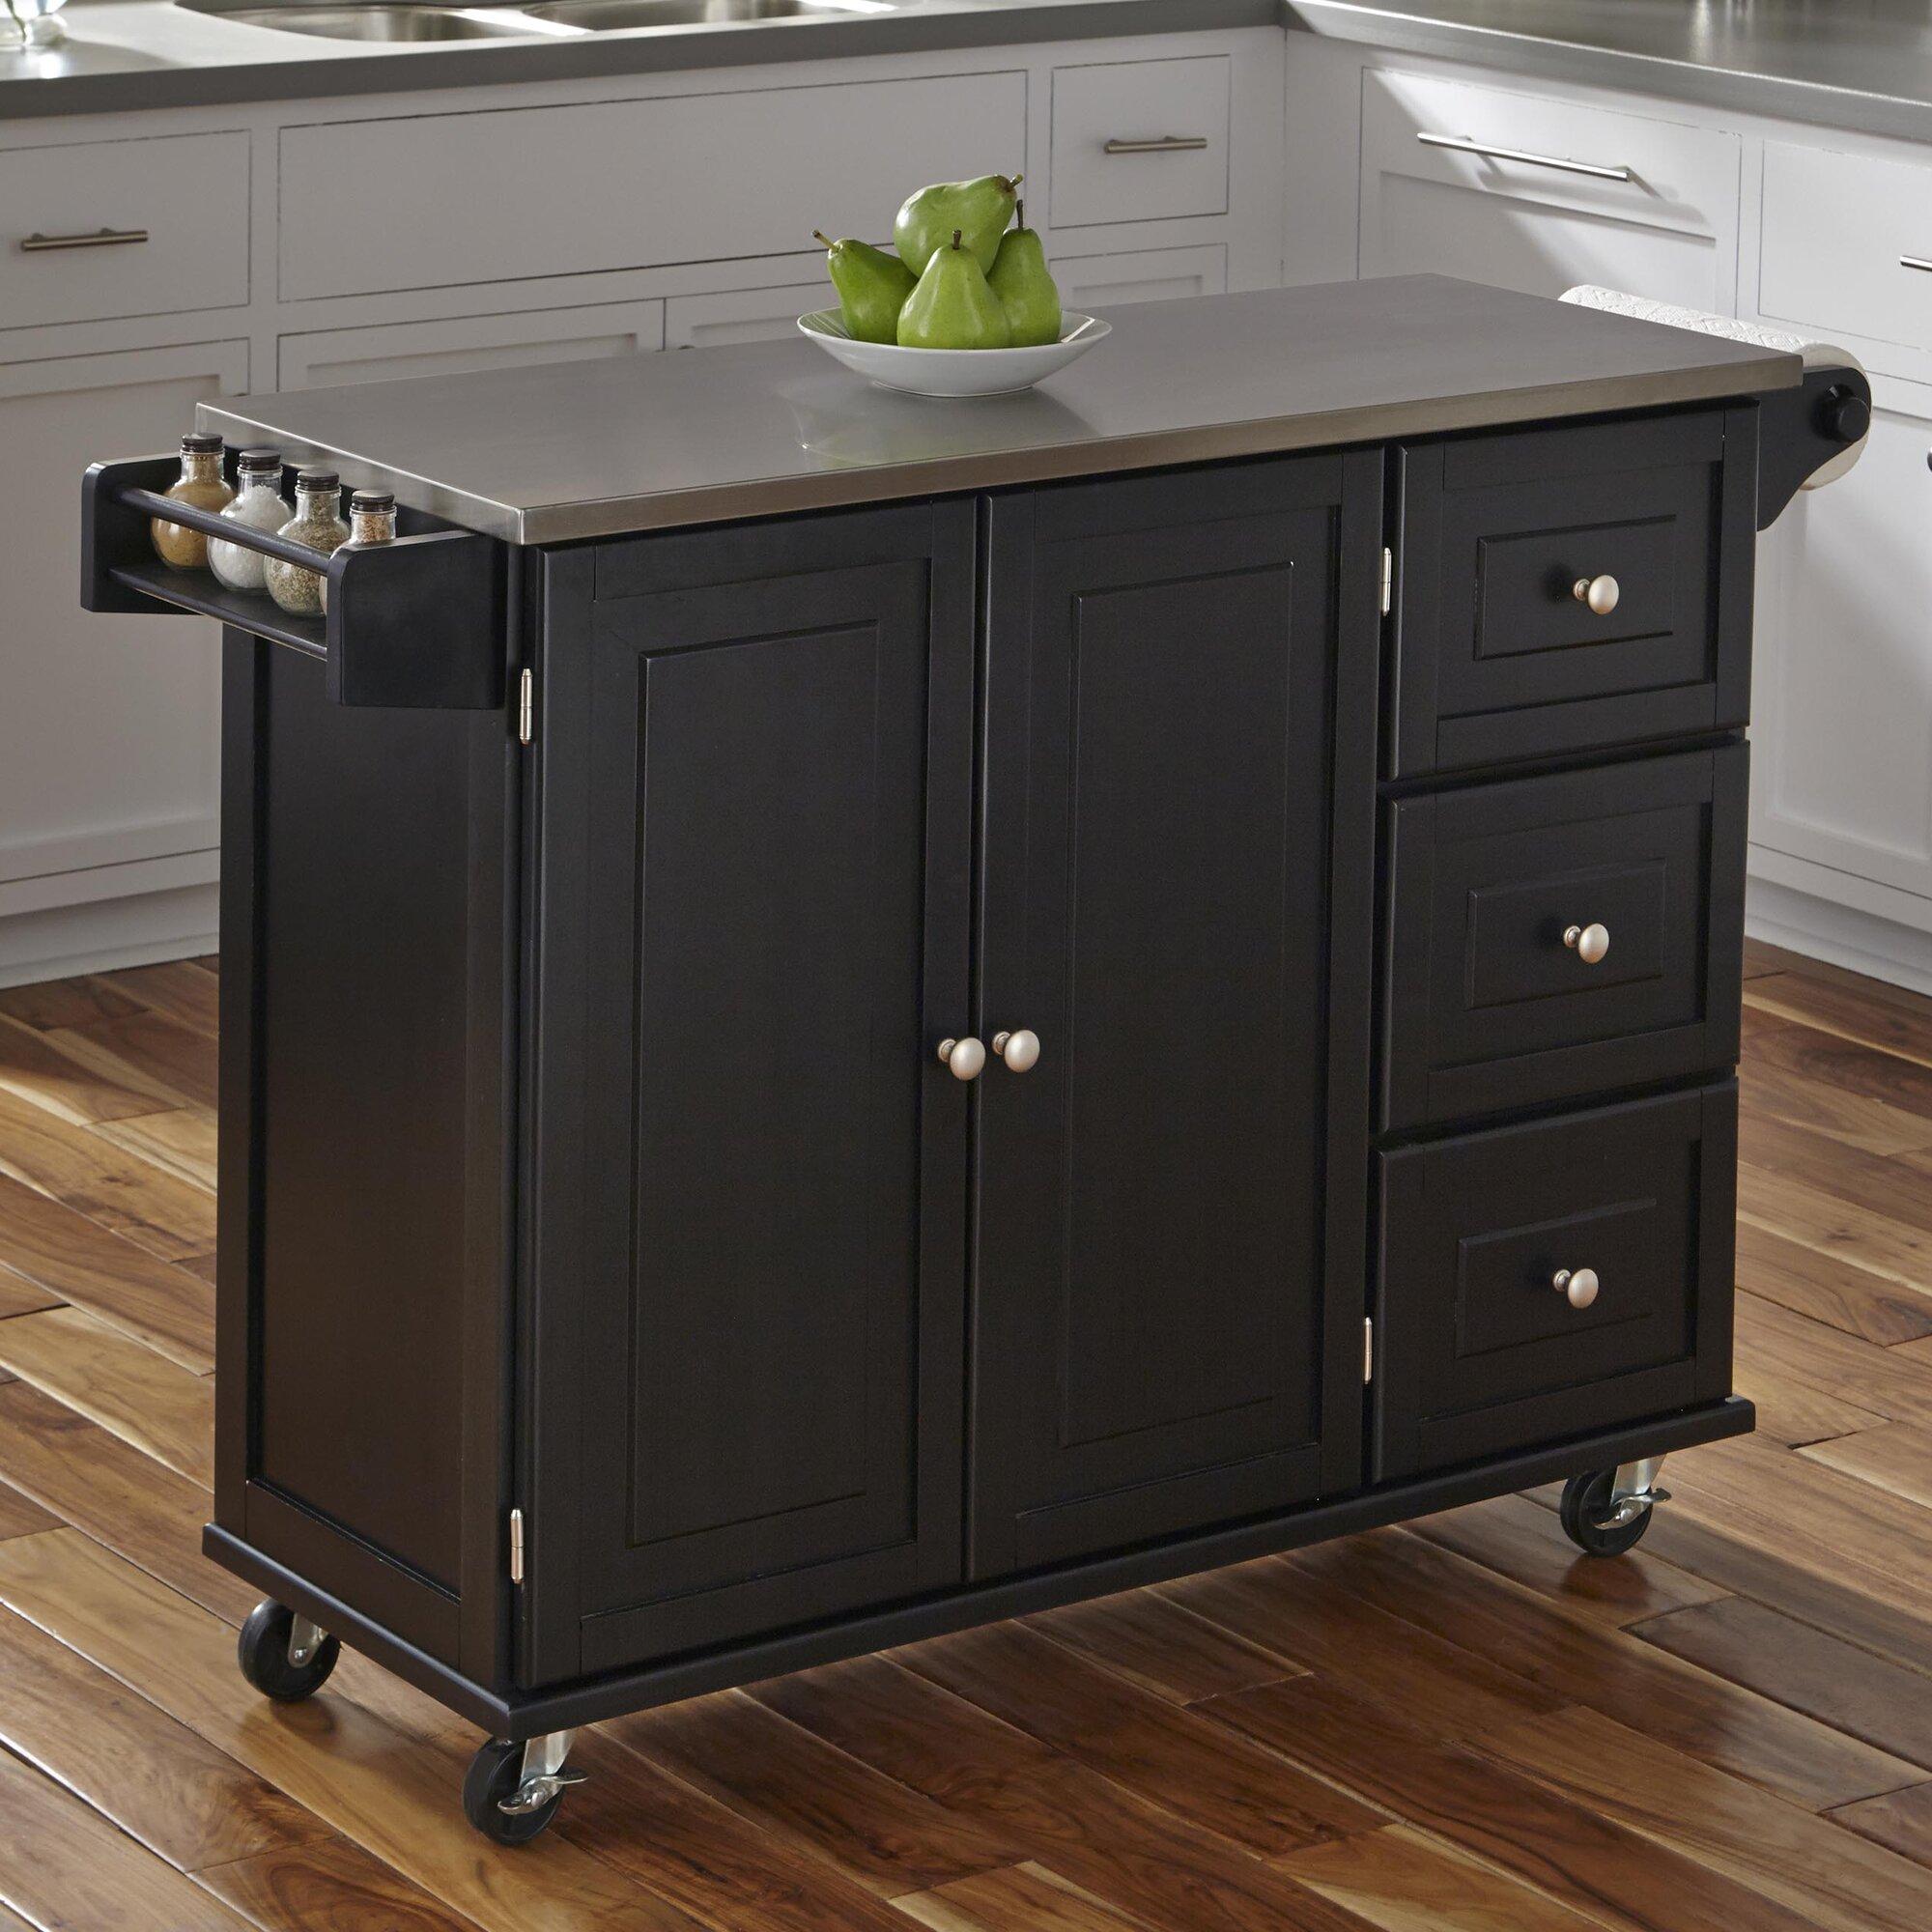 Uncategorized Stainless Steel Kitchen Island kitchen islands carts youll love wayfair